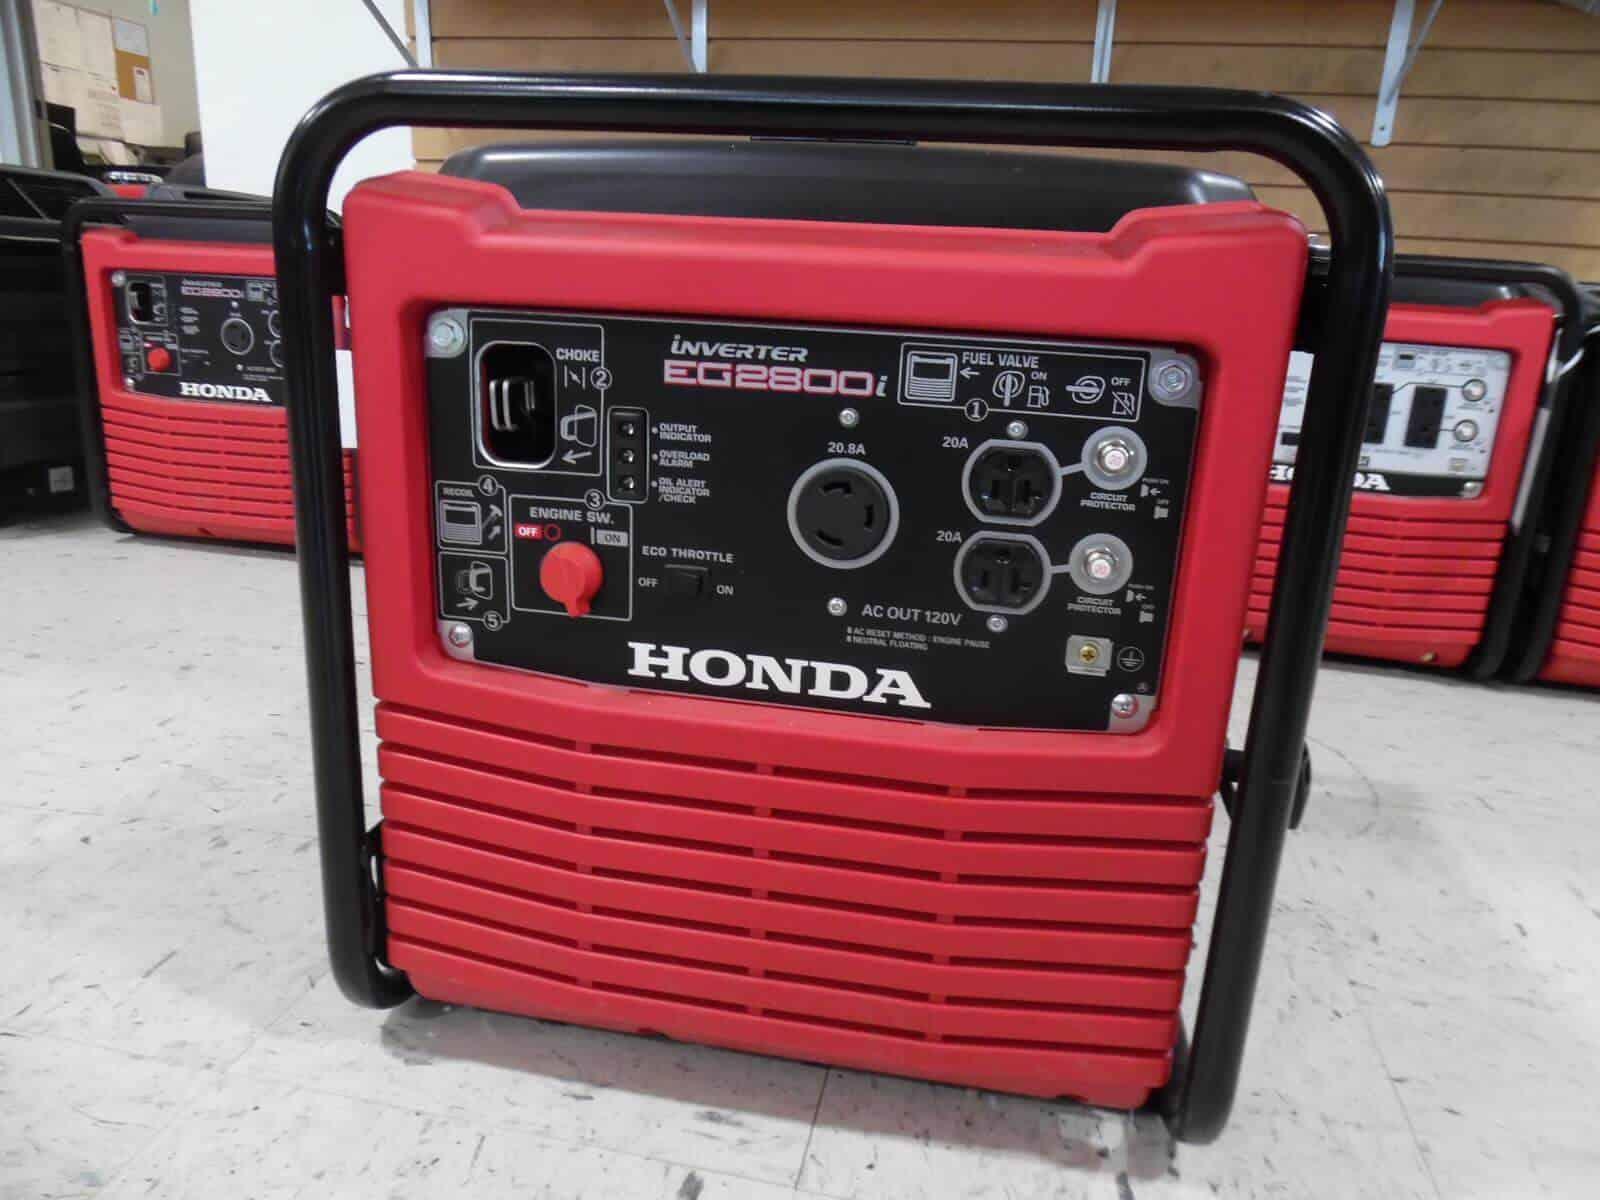 Honda EG2800IA-4